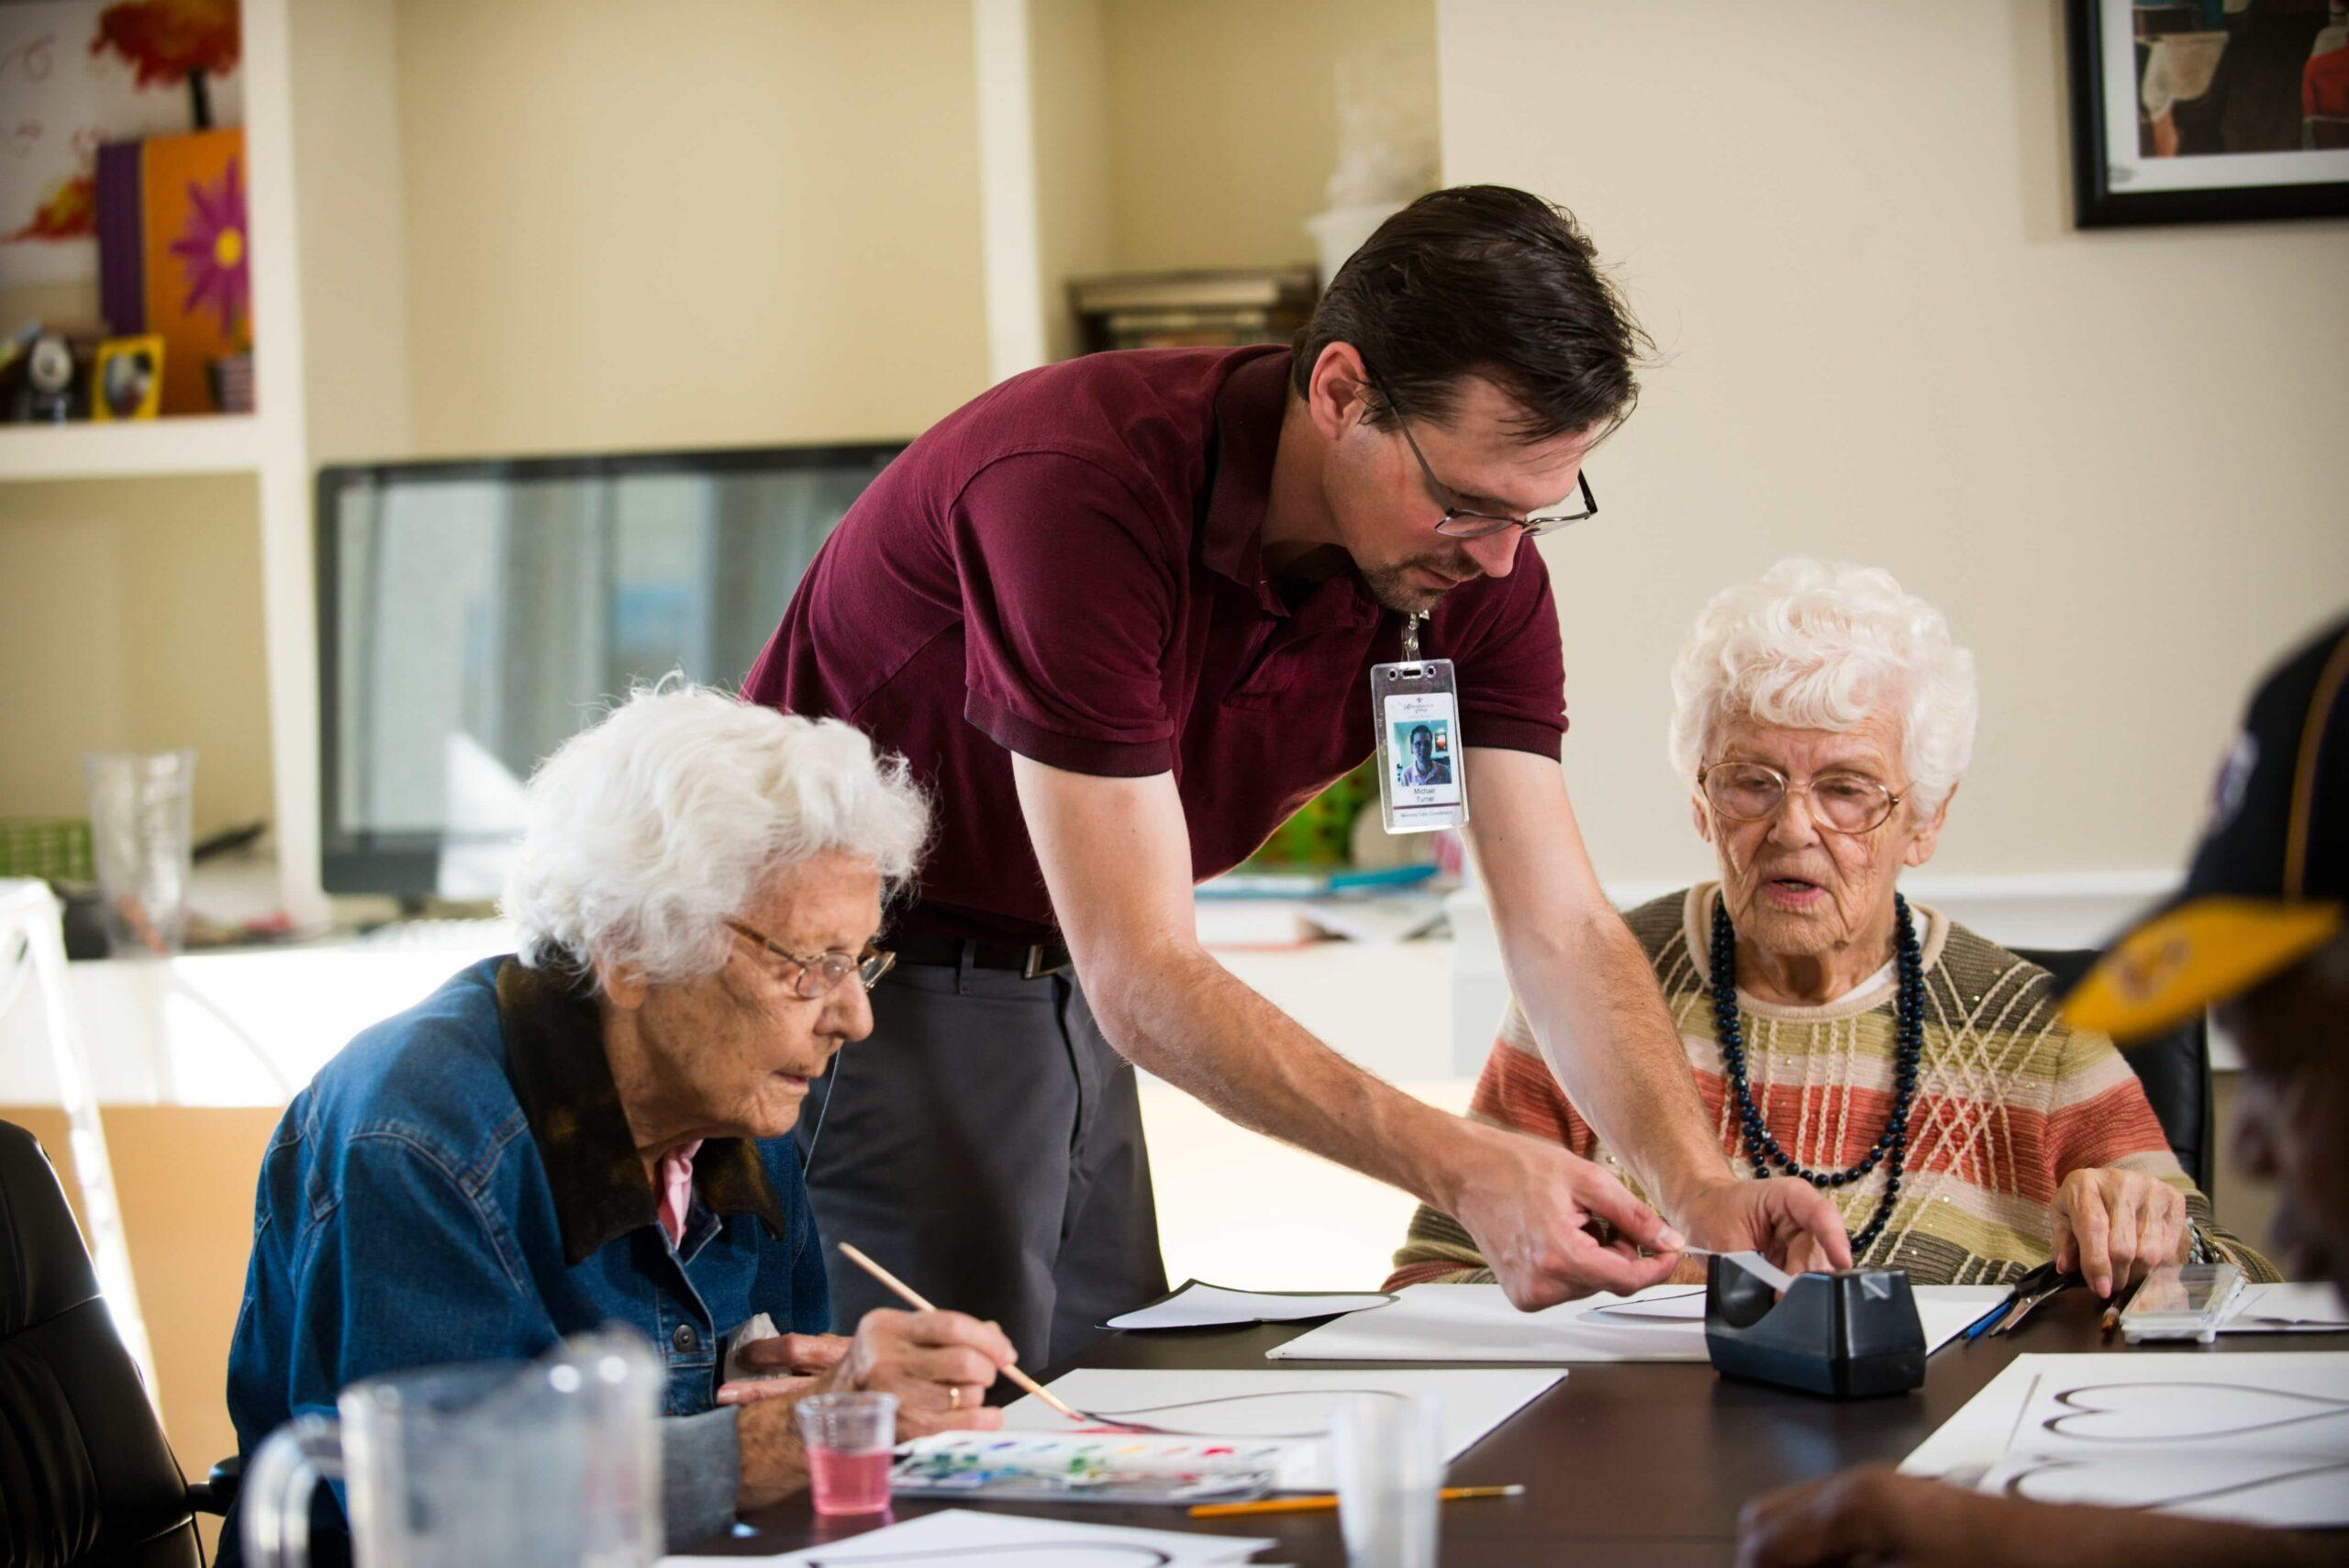 assisted living vs. nursing home